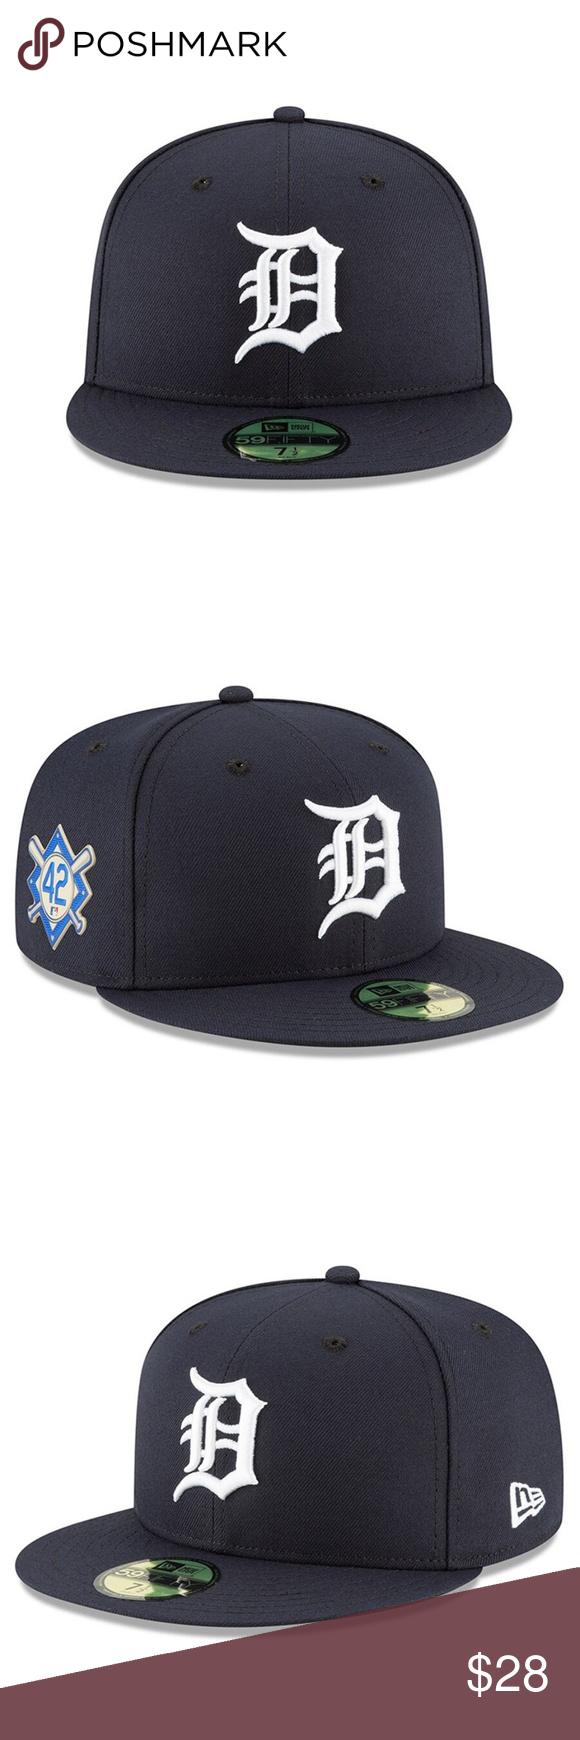 New Era 59fifty Detroit Tigers Jackie Robinson New Era 59fifty Jackie Robinson Detroit Tigers